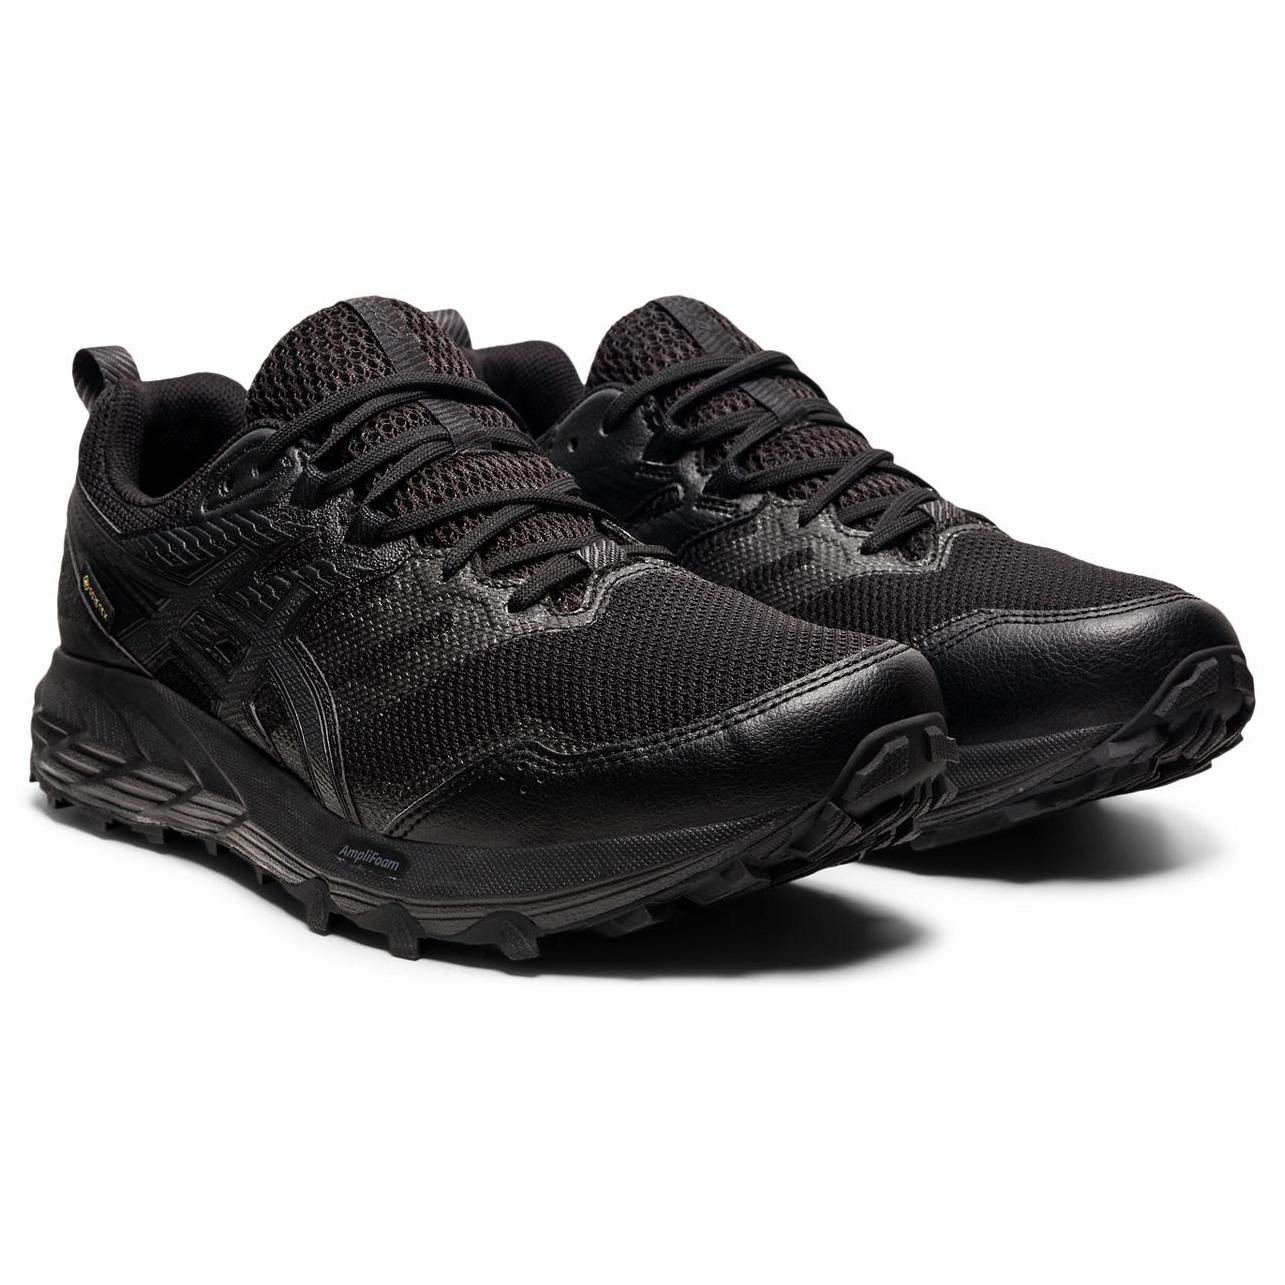 Asics - Gel-Sonoma 6 GTX - Trail running shoes - Black / Marigold Orange | 7,5 (US)